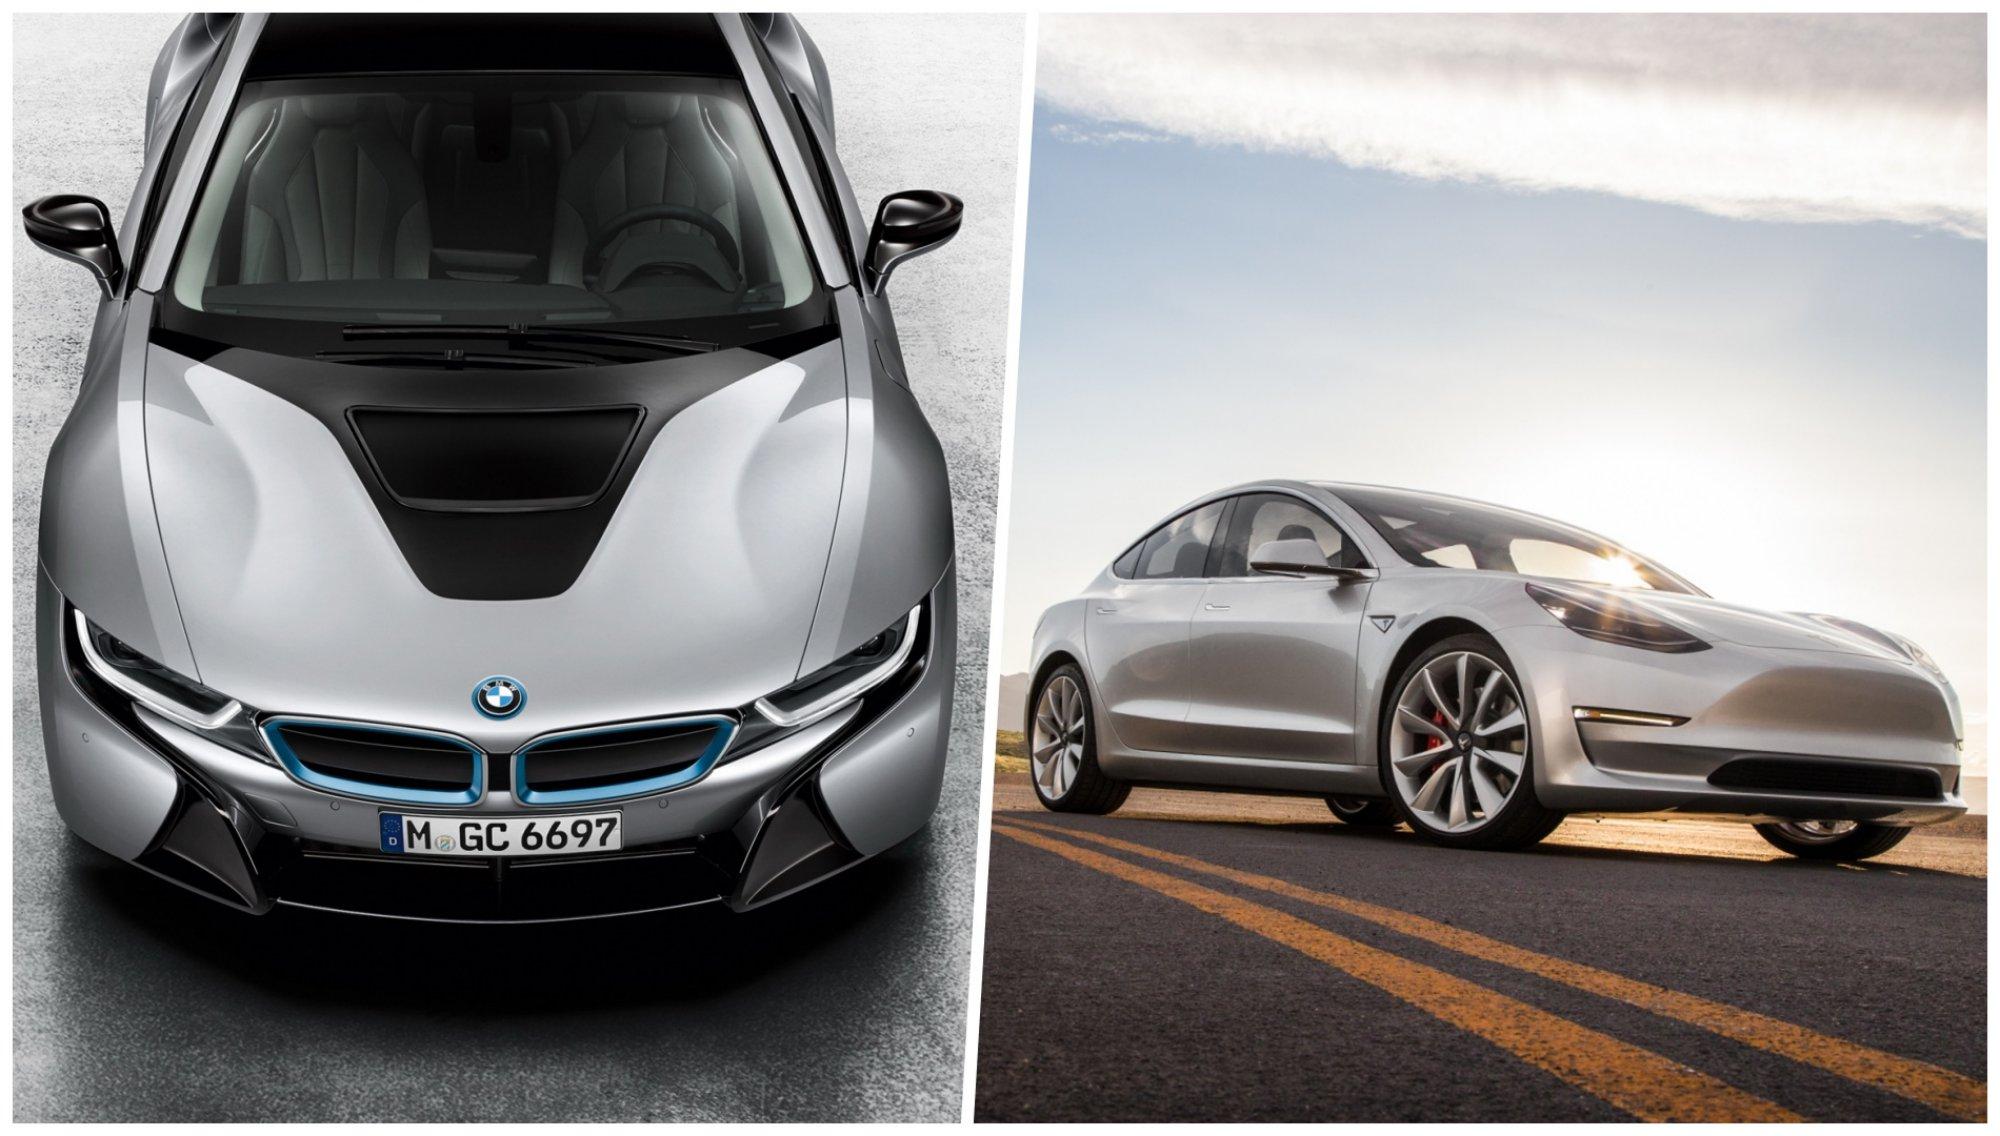 News - 2021 BMW i5 To Bring Fight To Tesla Model 3